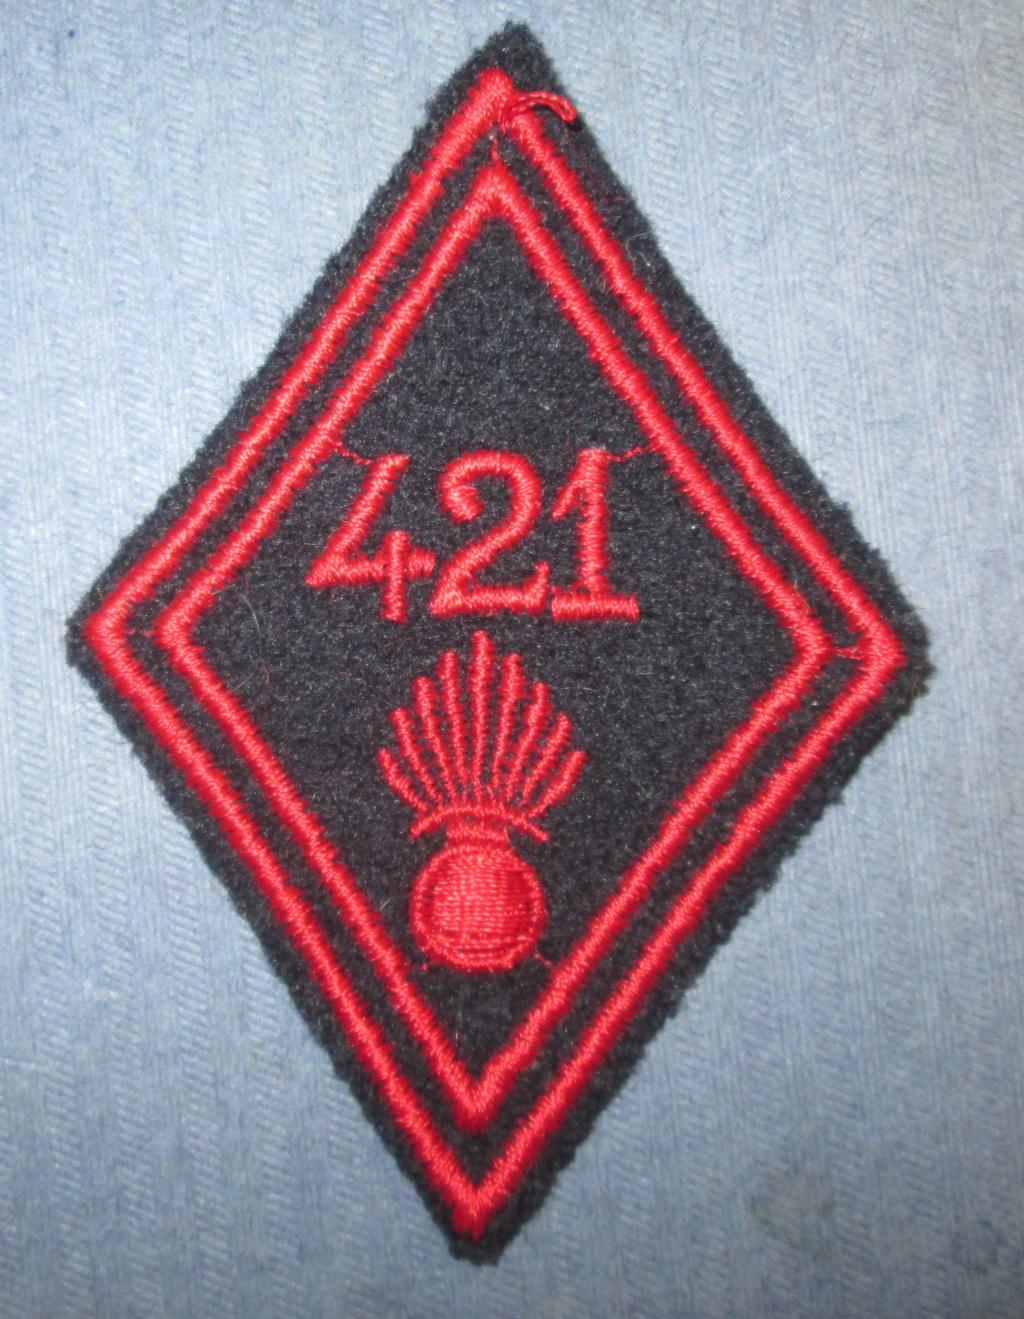 Losange de Bras 421° R.I? Img_2610